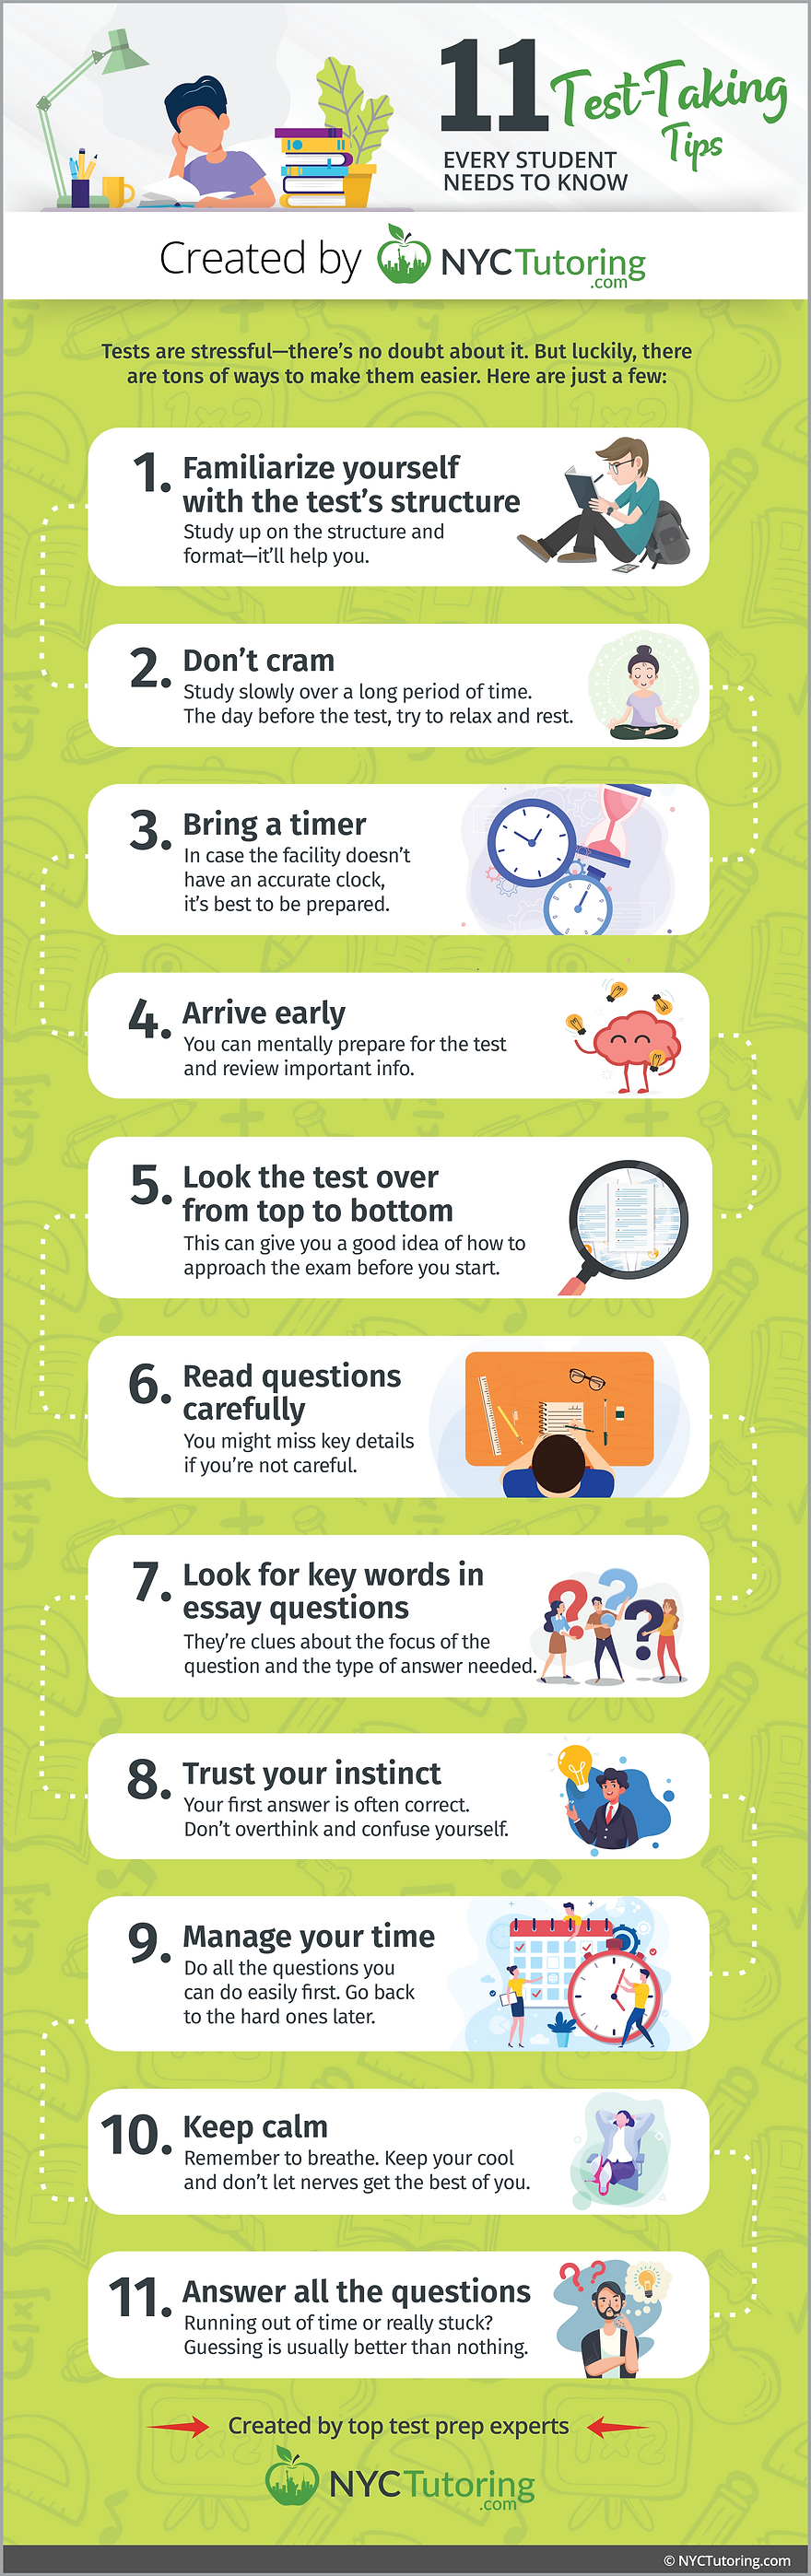 11 Test-Taking Tips